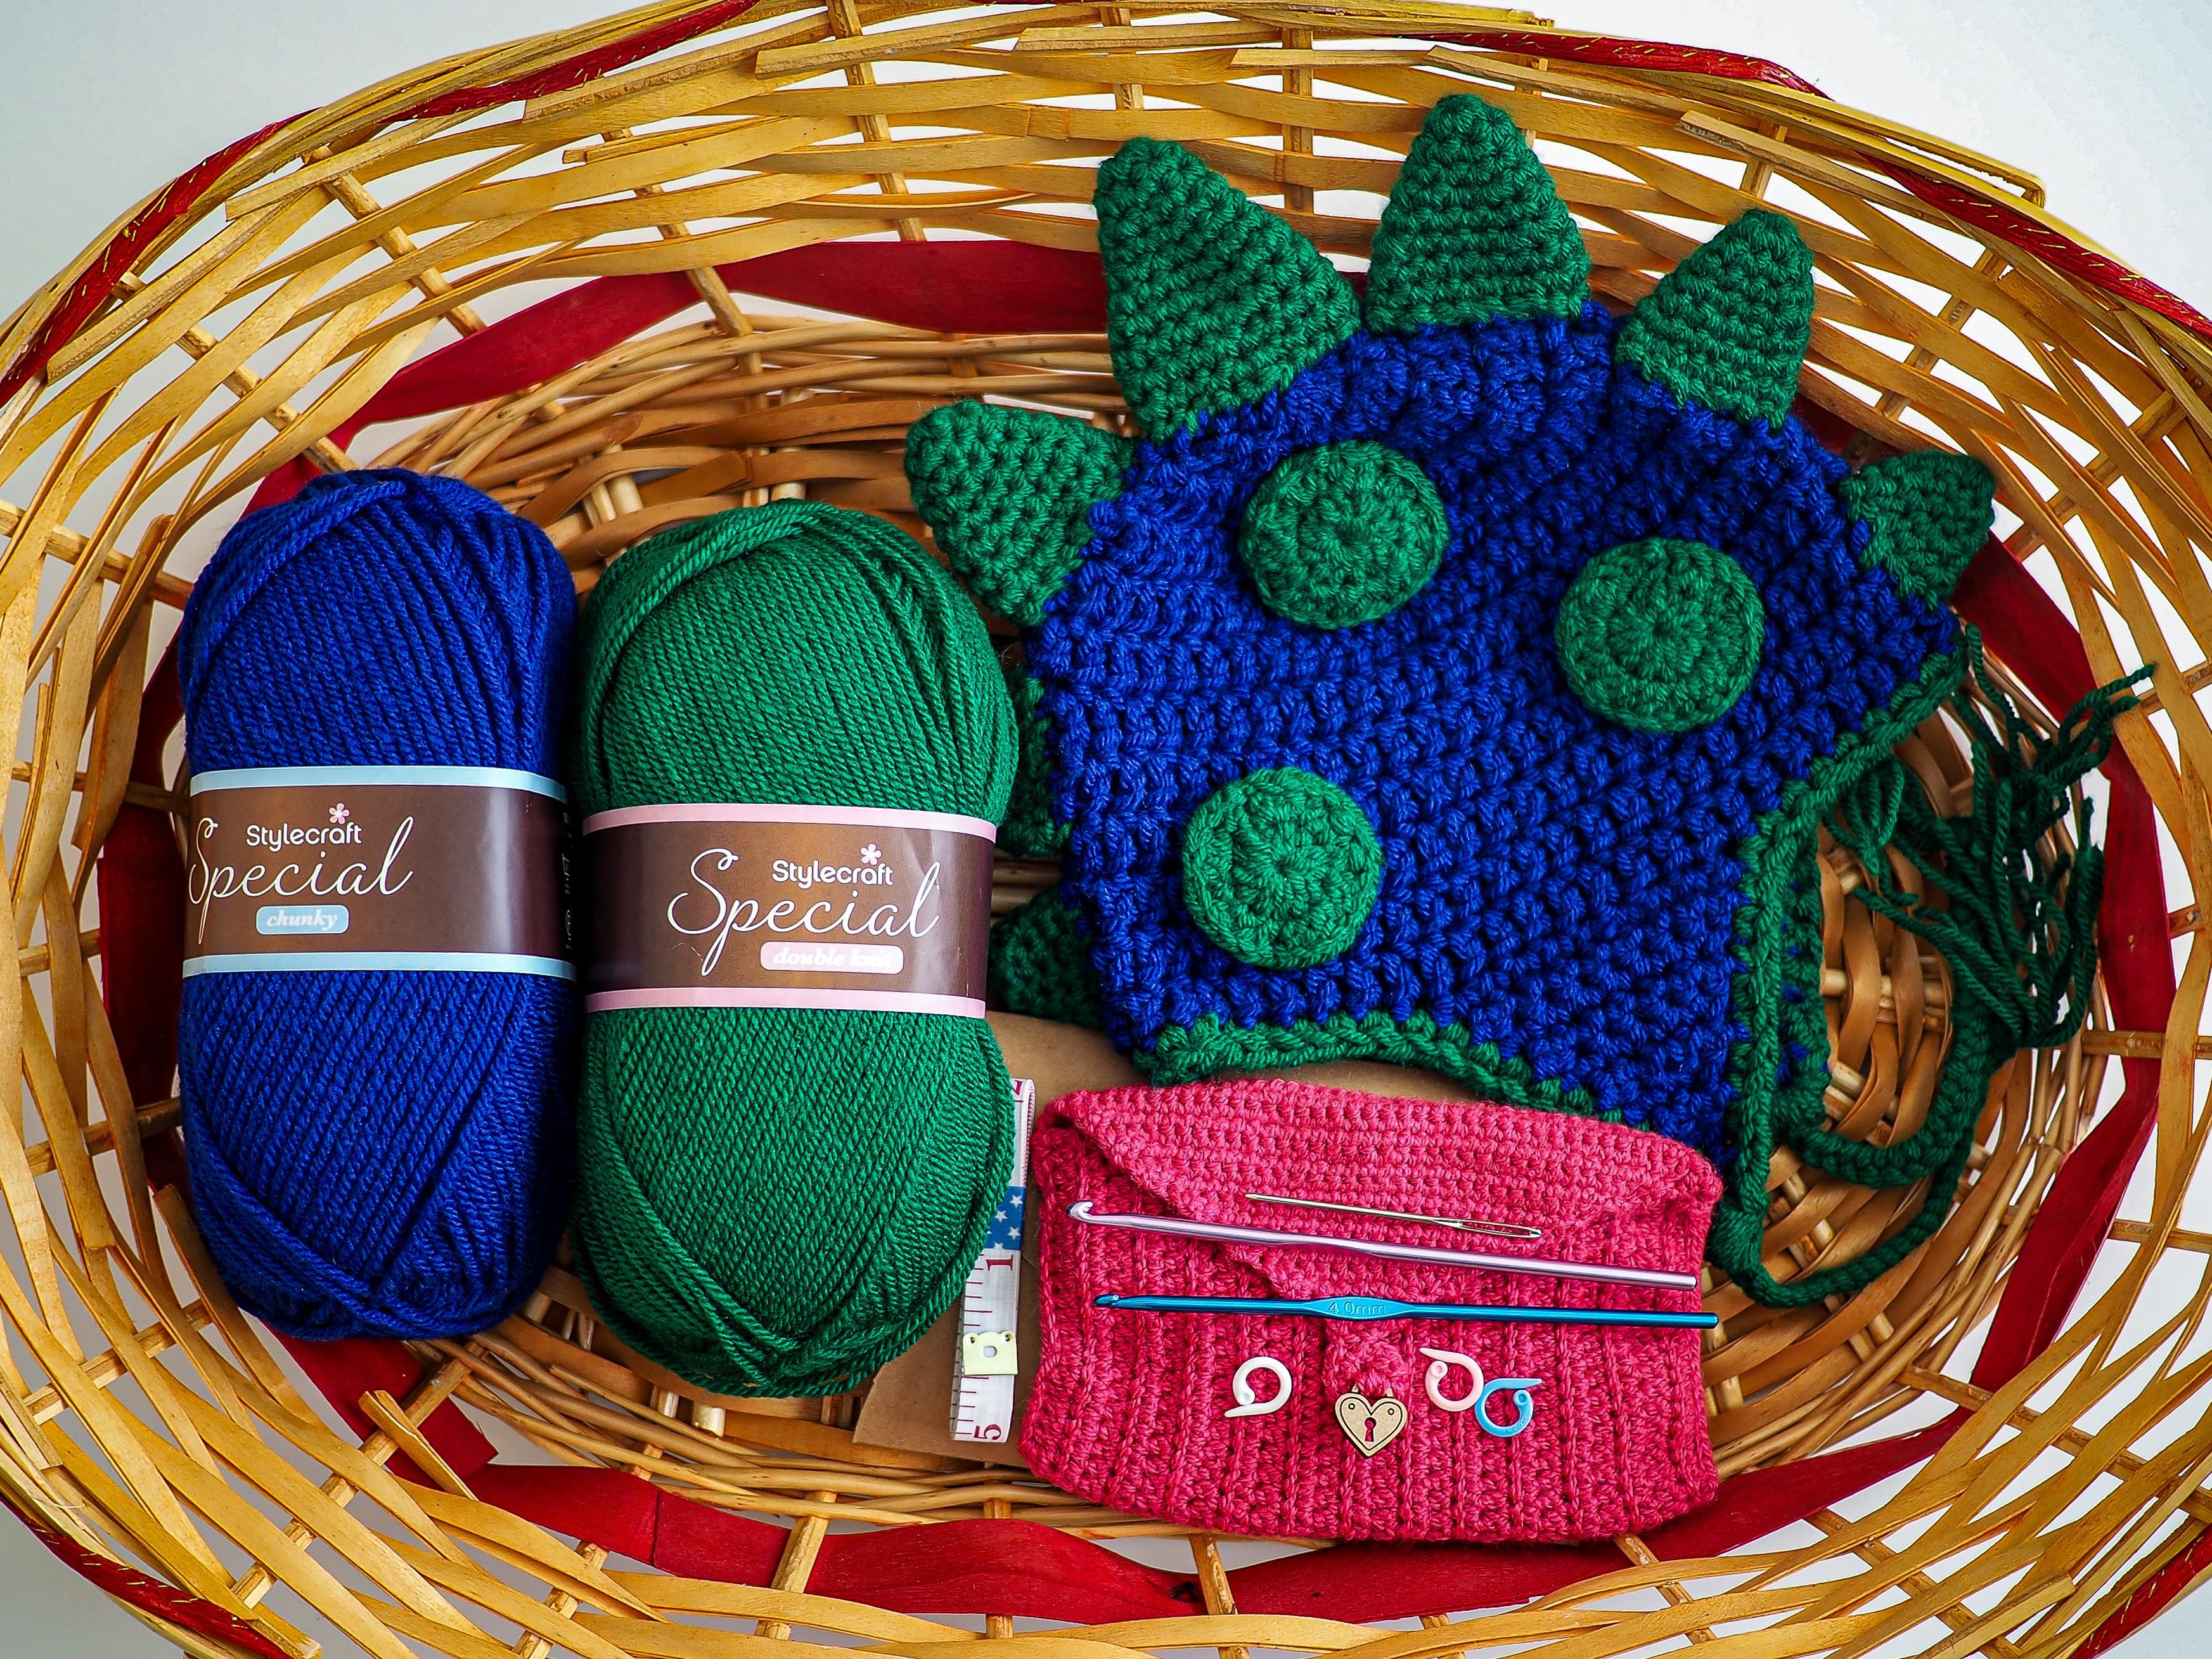 crochet kit and blue dragon hat